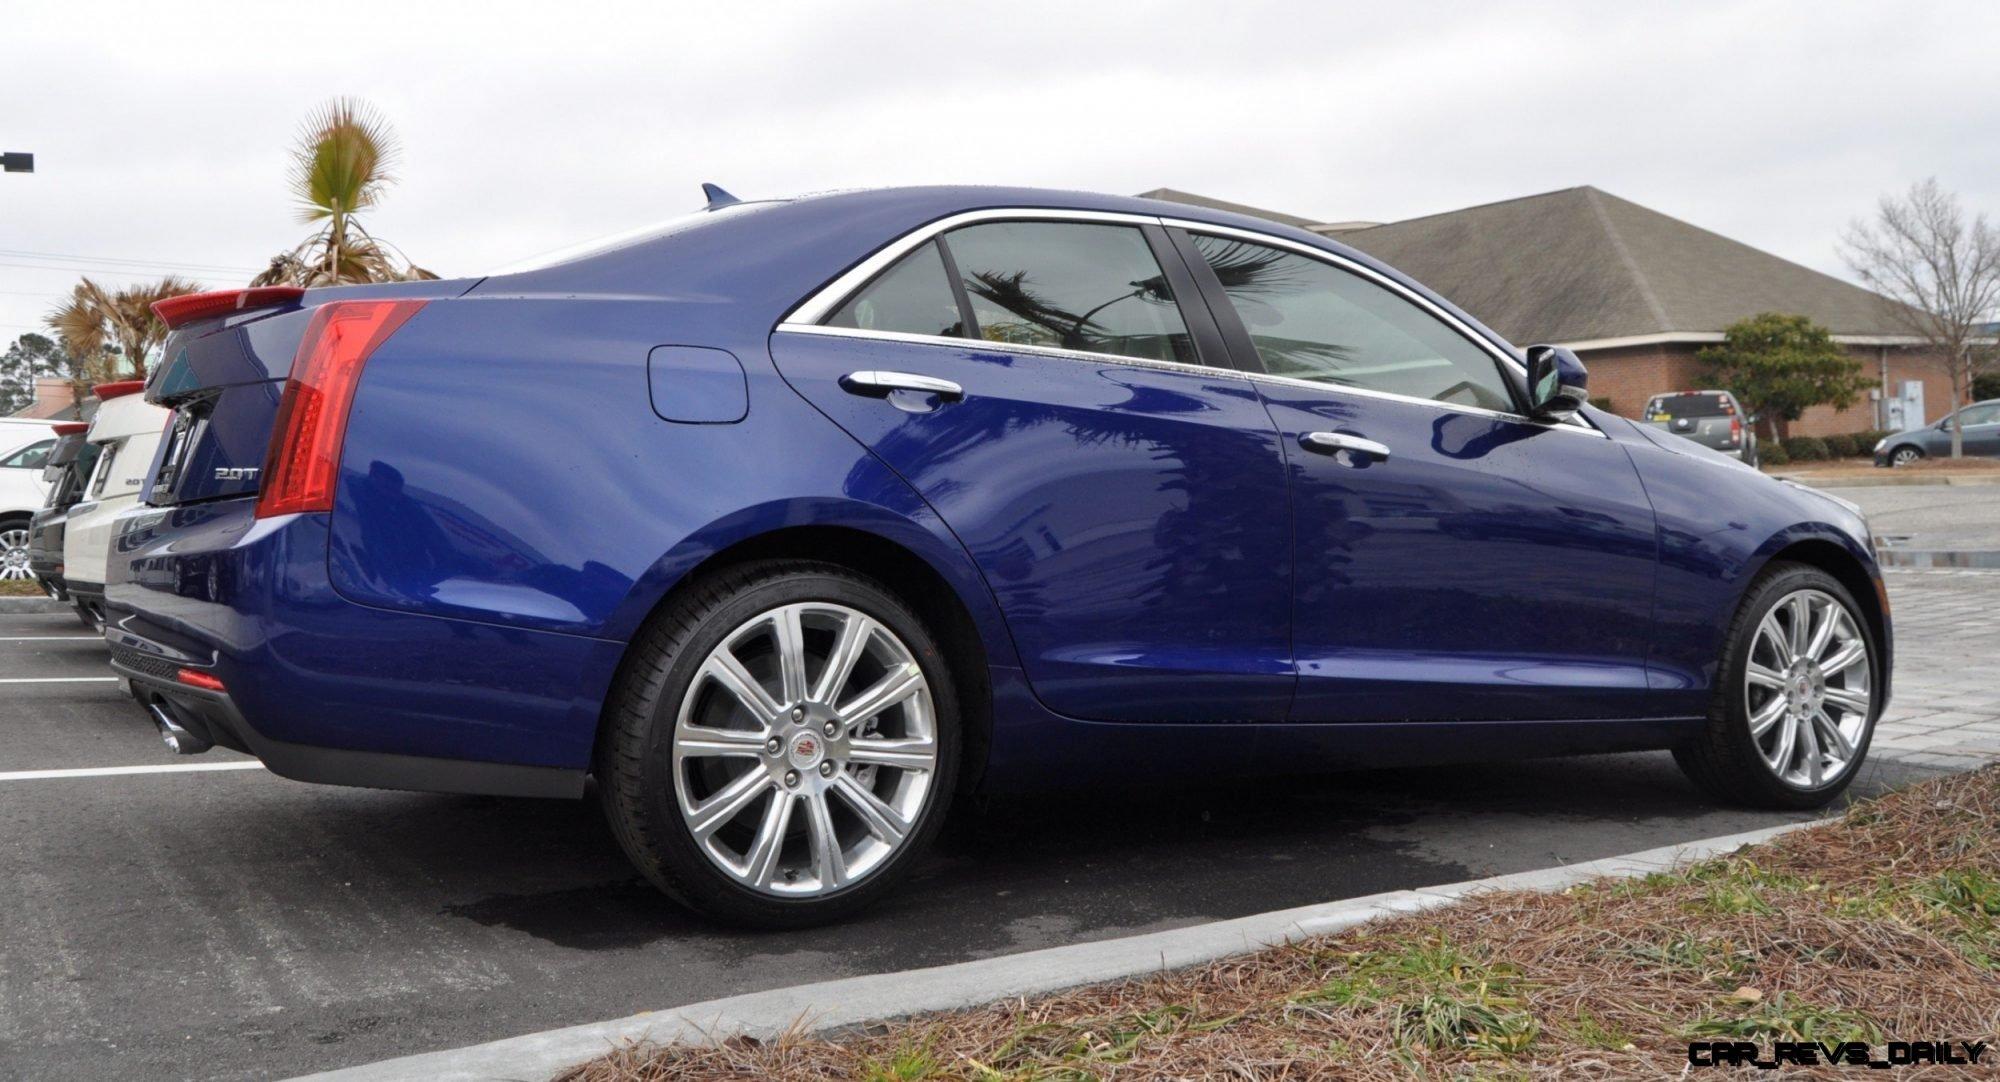 2014 Cadillac ATS4 - High-Res Photos 6